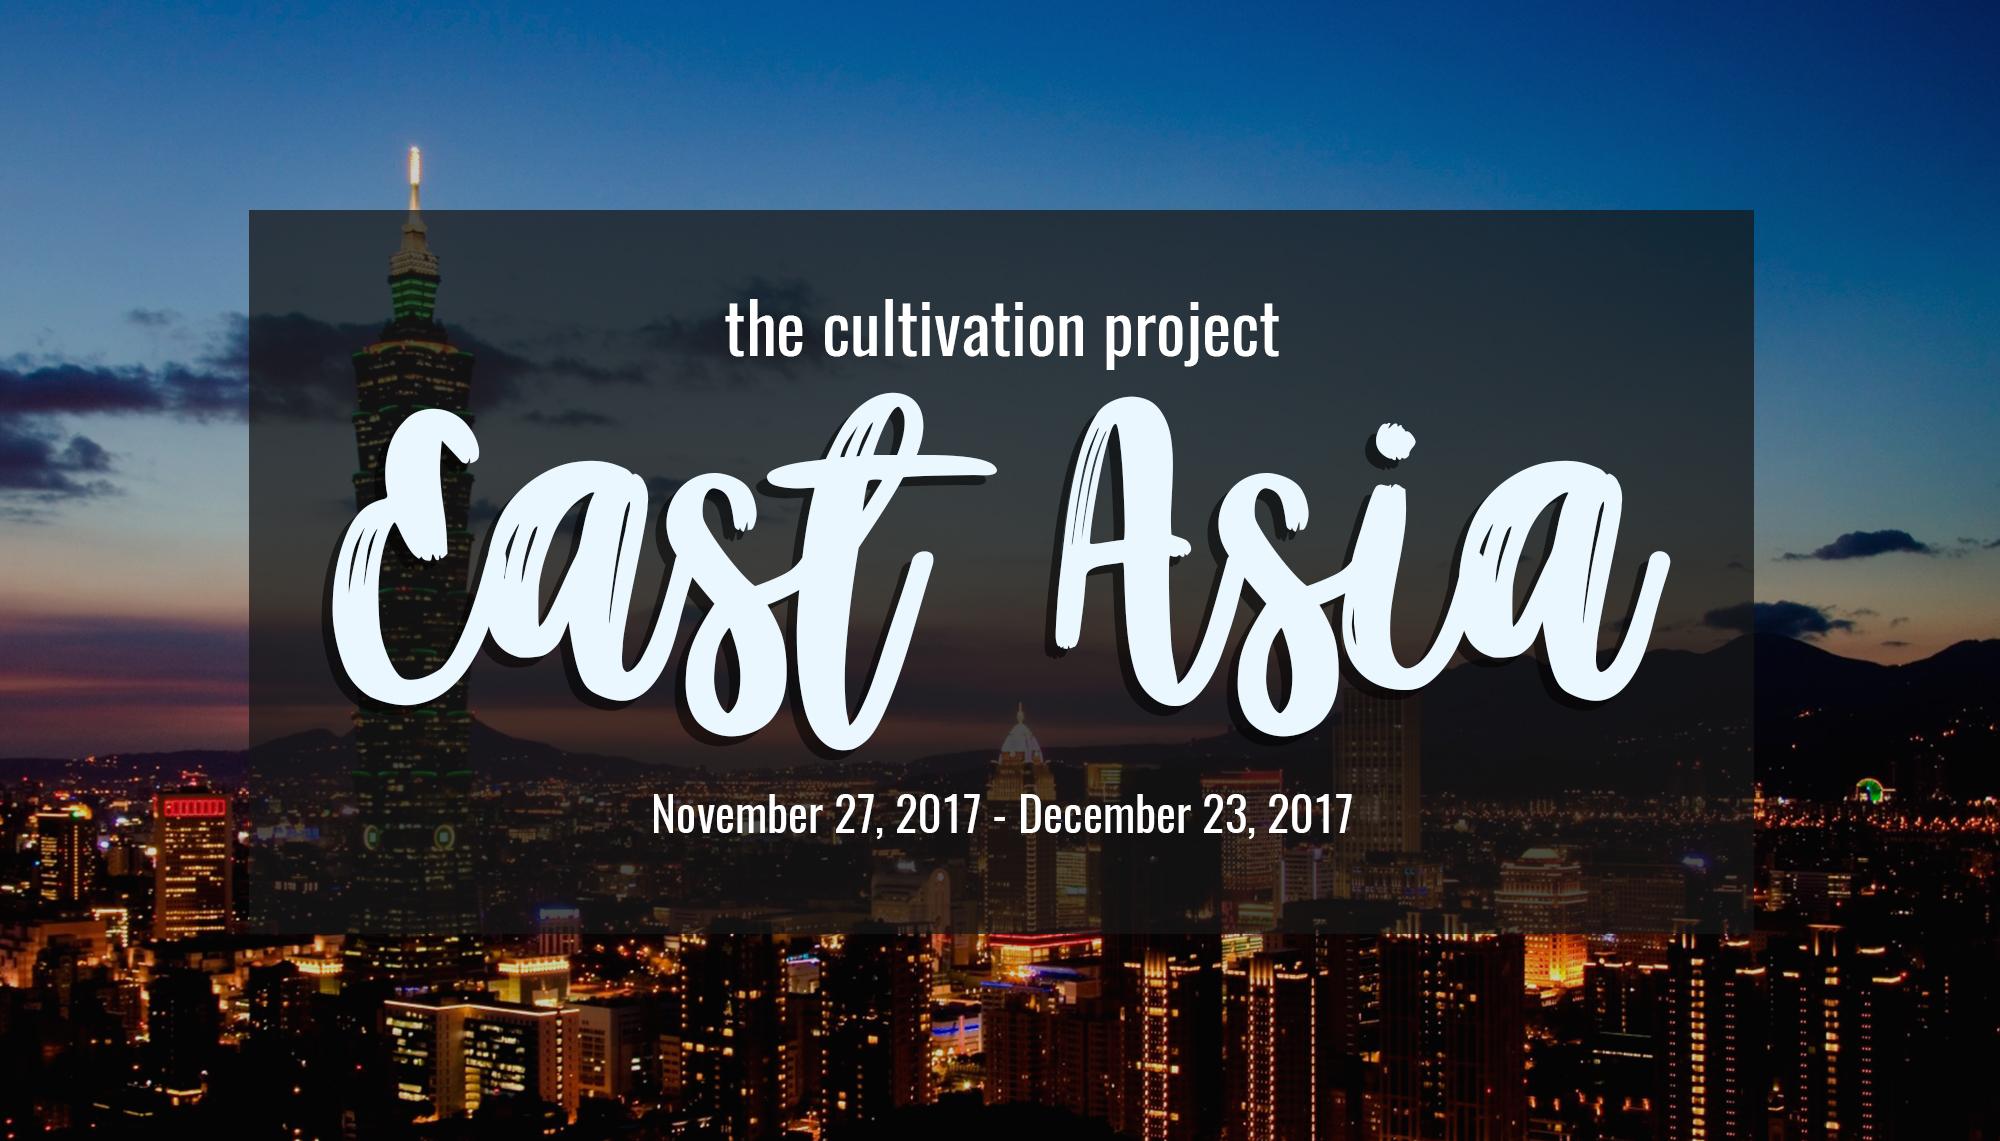 TCP East Asia Cover Photo 10.25.17.jpg